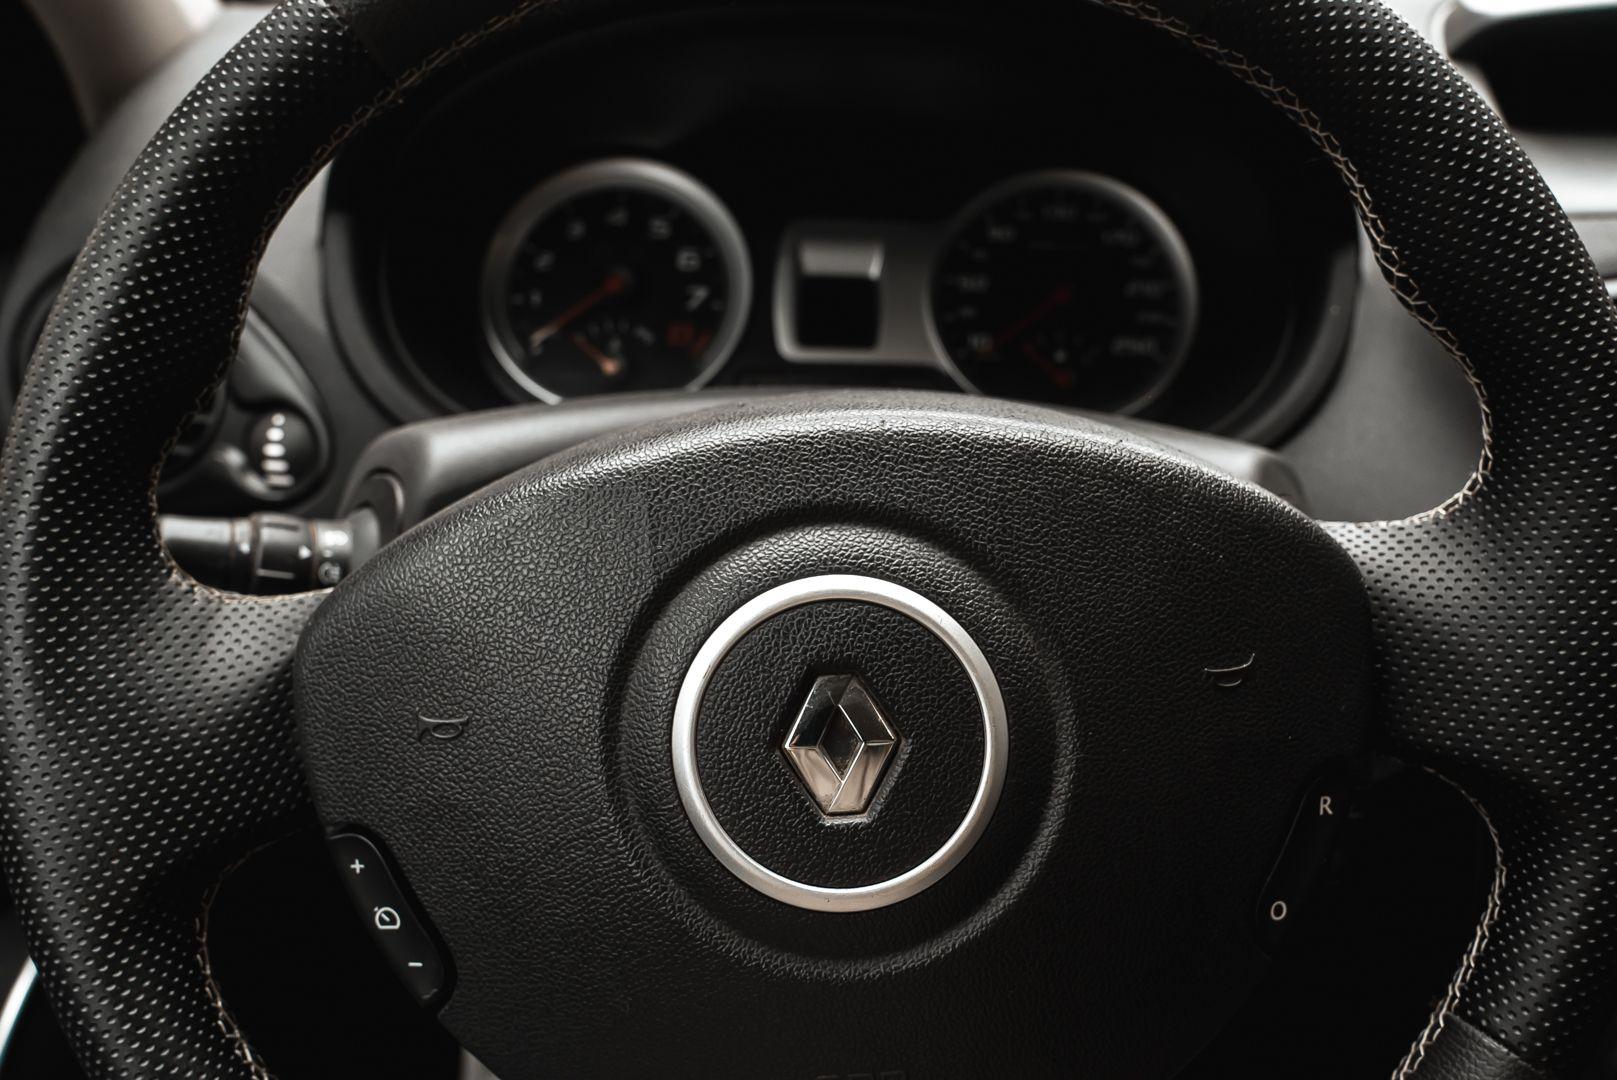 2006 Renault Clio 2.0 RS 81119